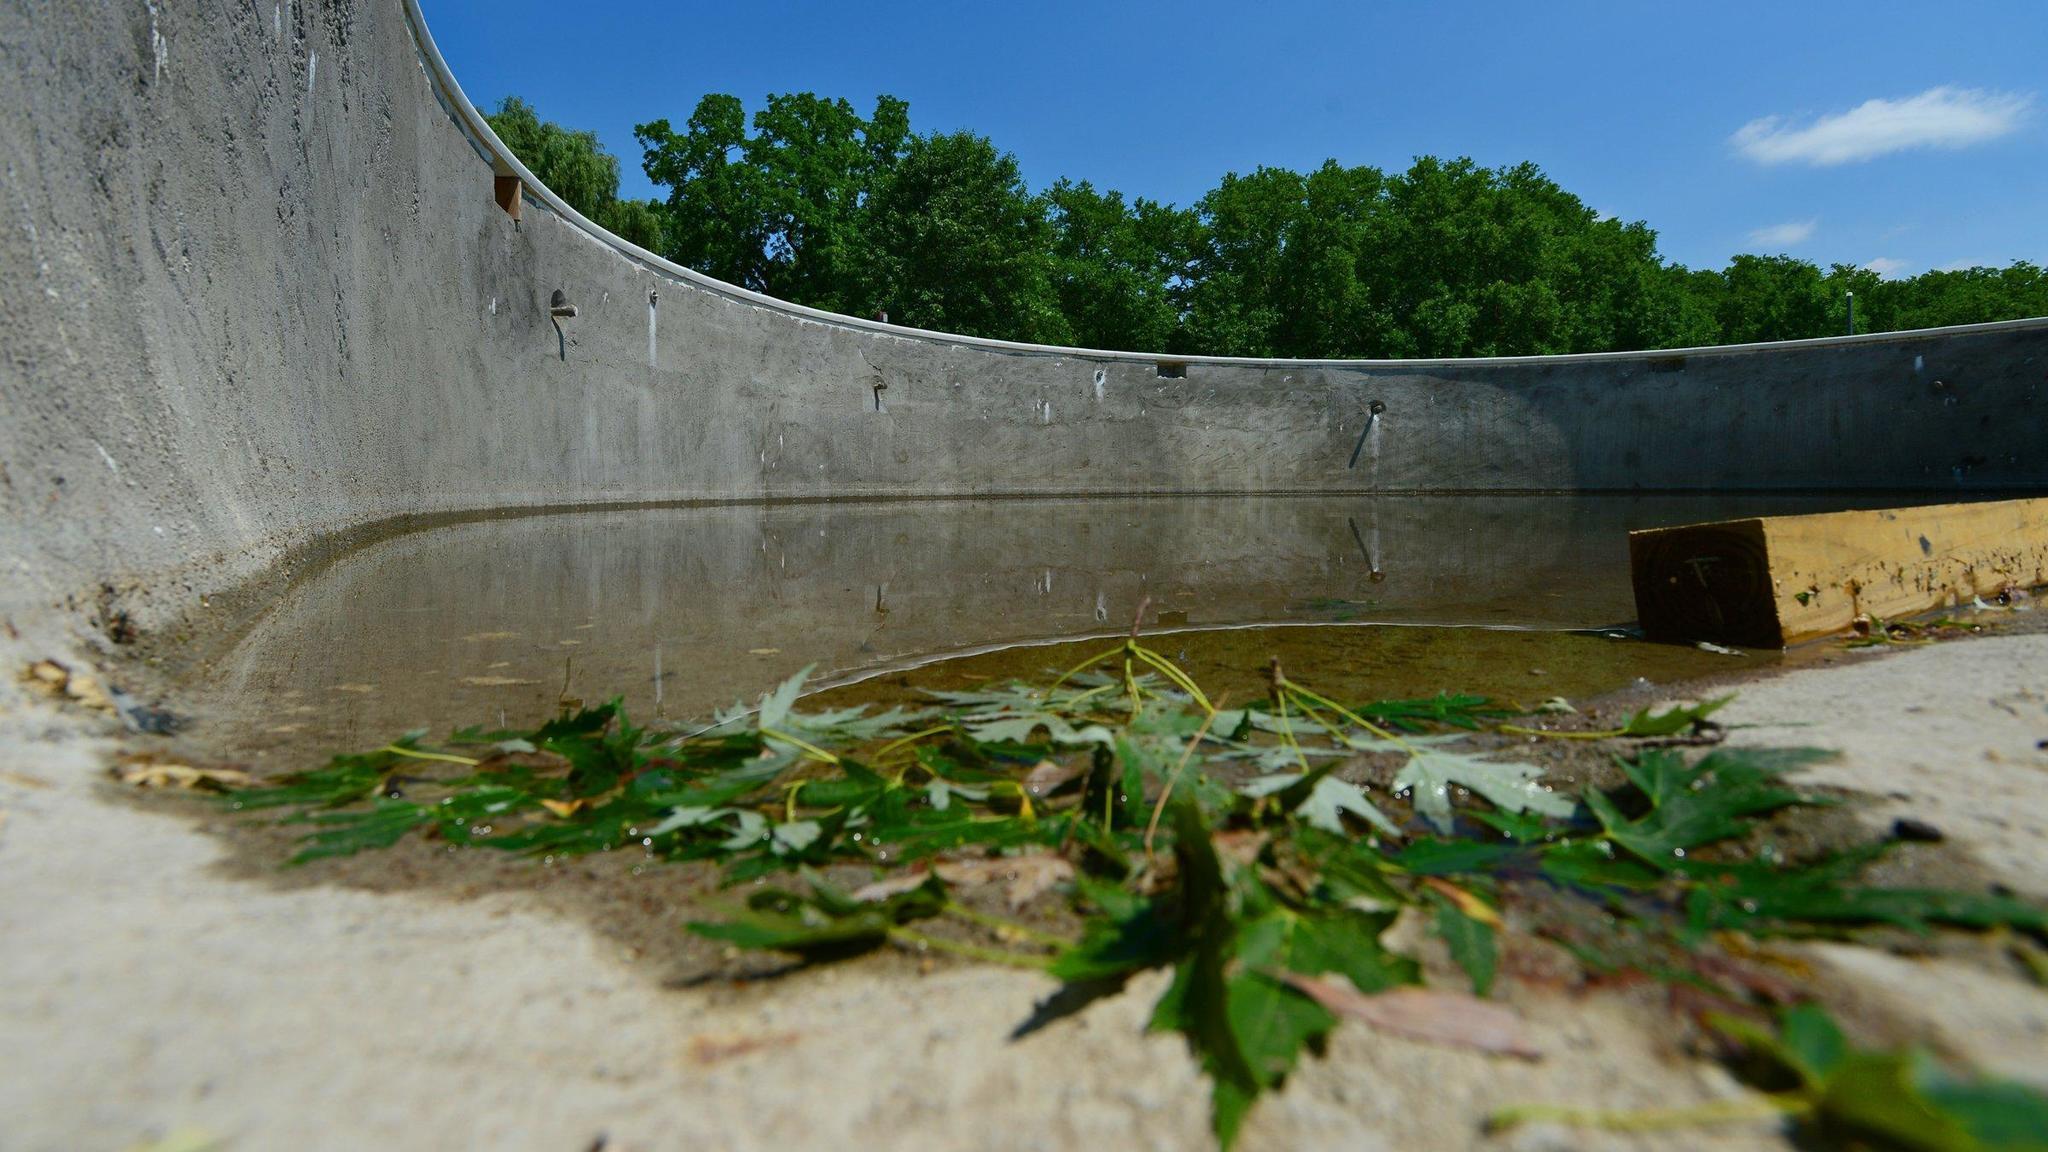 Allentown cedar beach pool woes could ruin another summer - Cedar beach swimming pool allentown pa ...